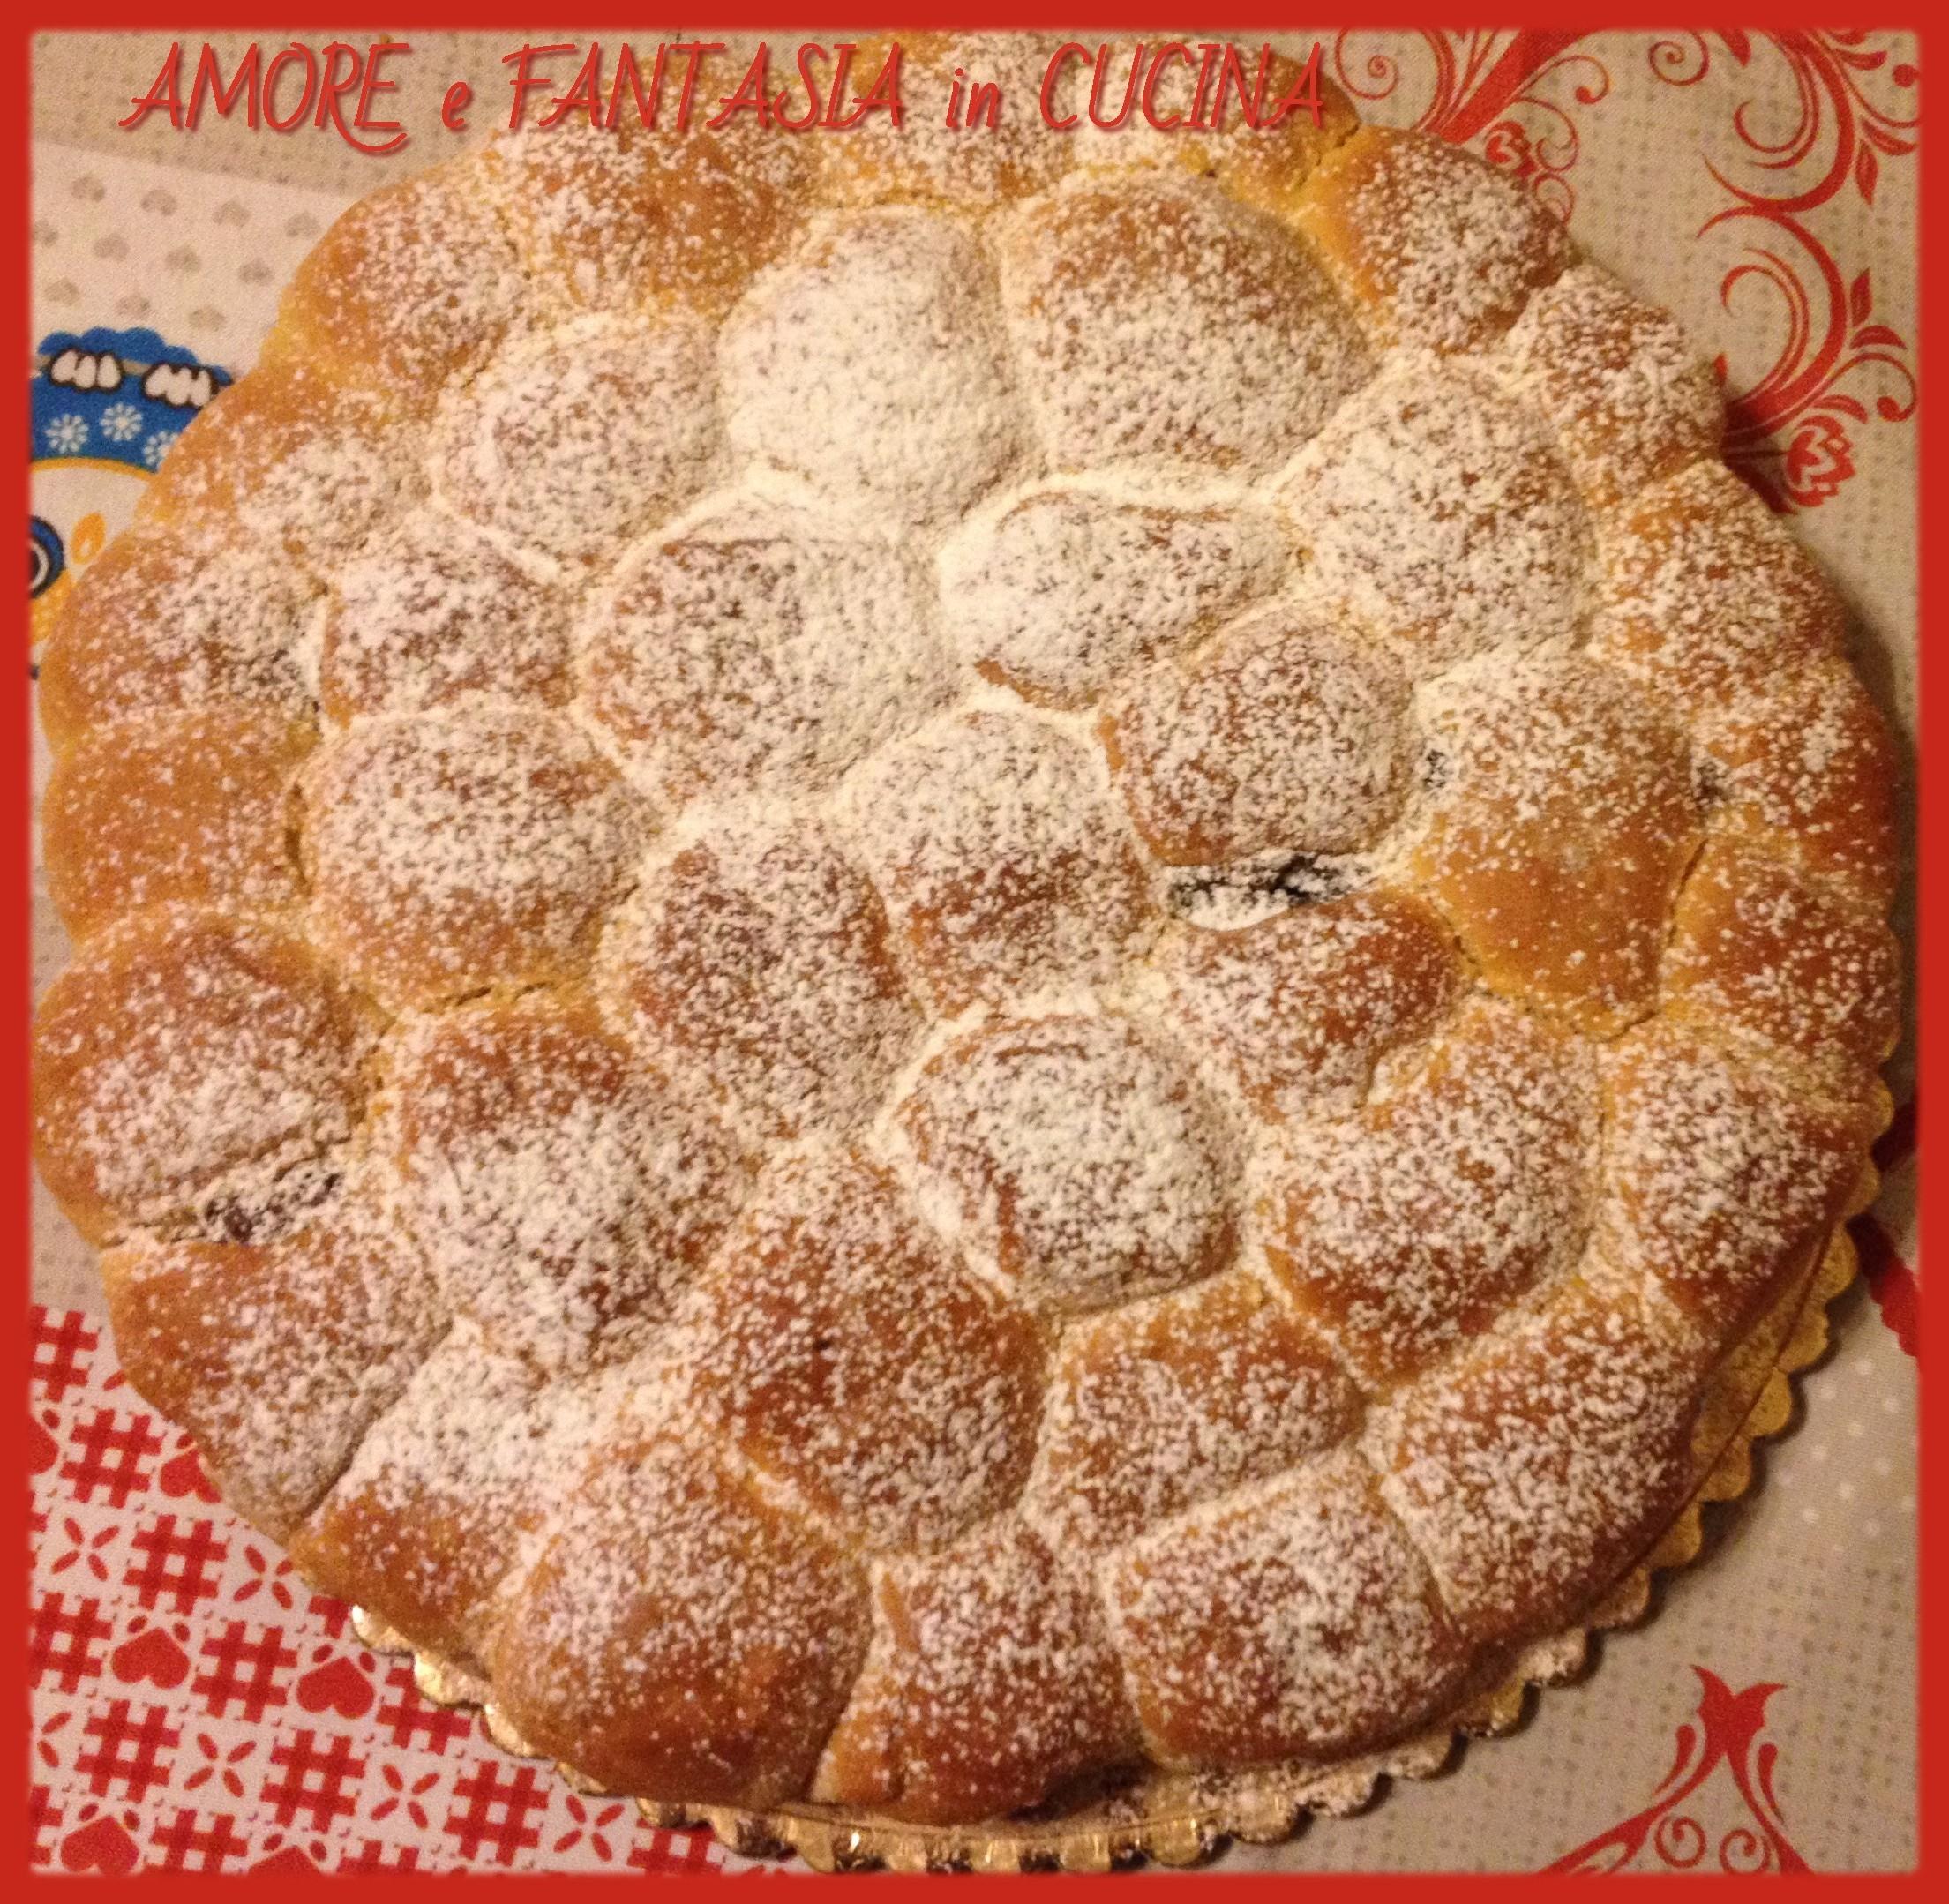 danubio nutella 2.jpg